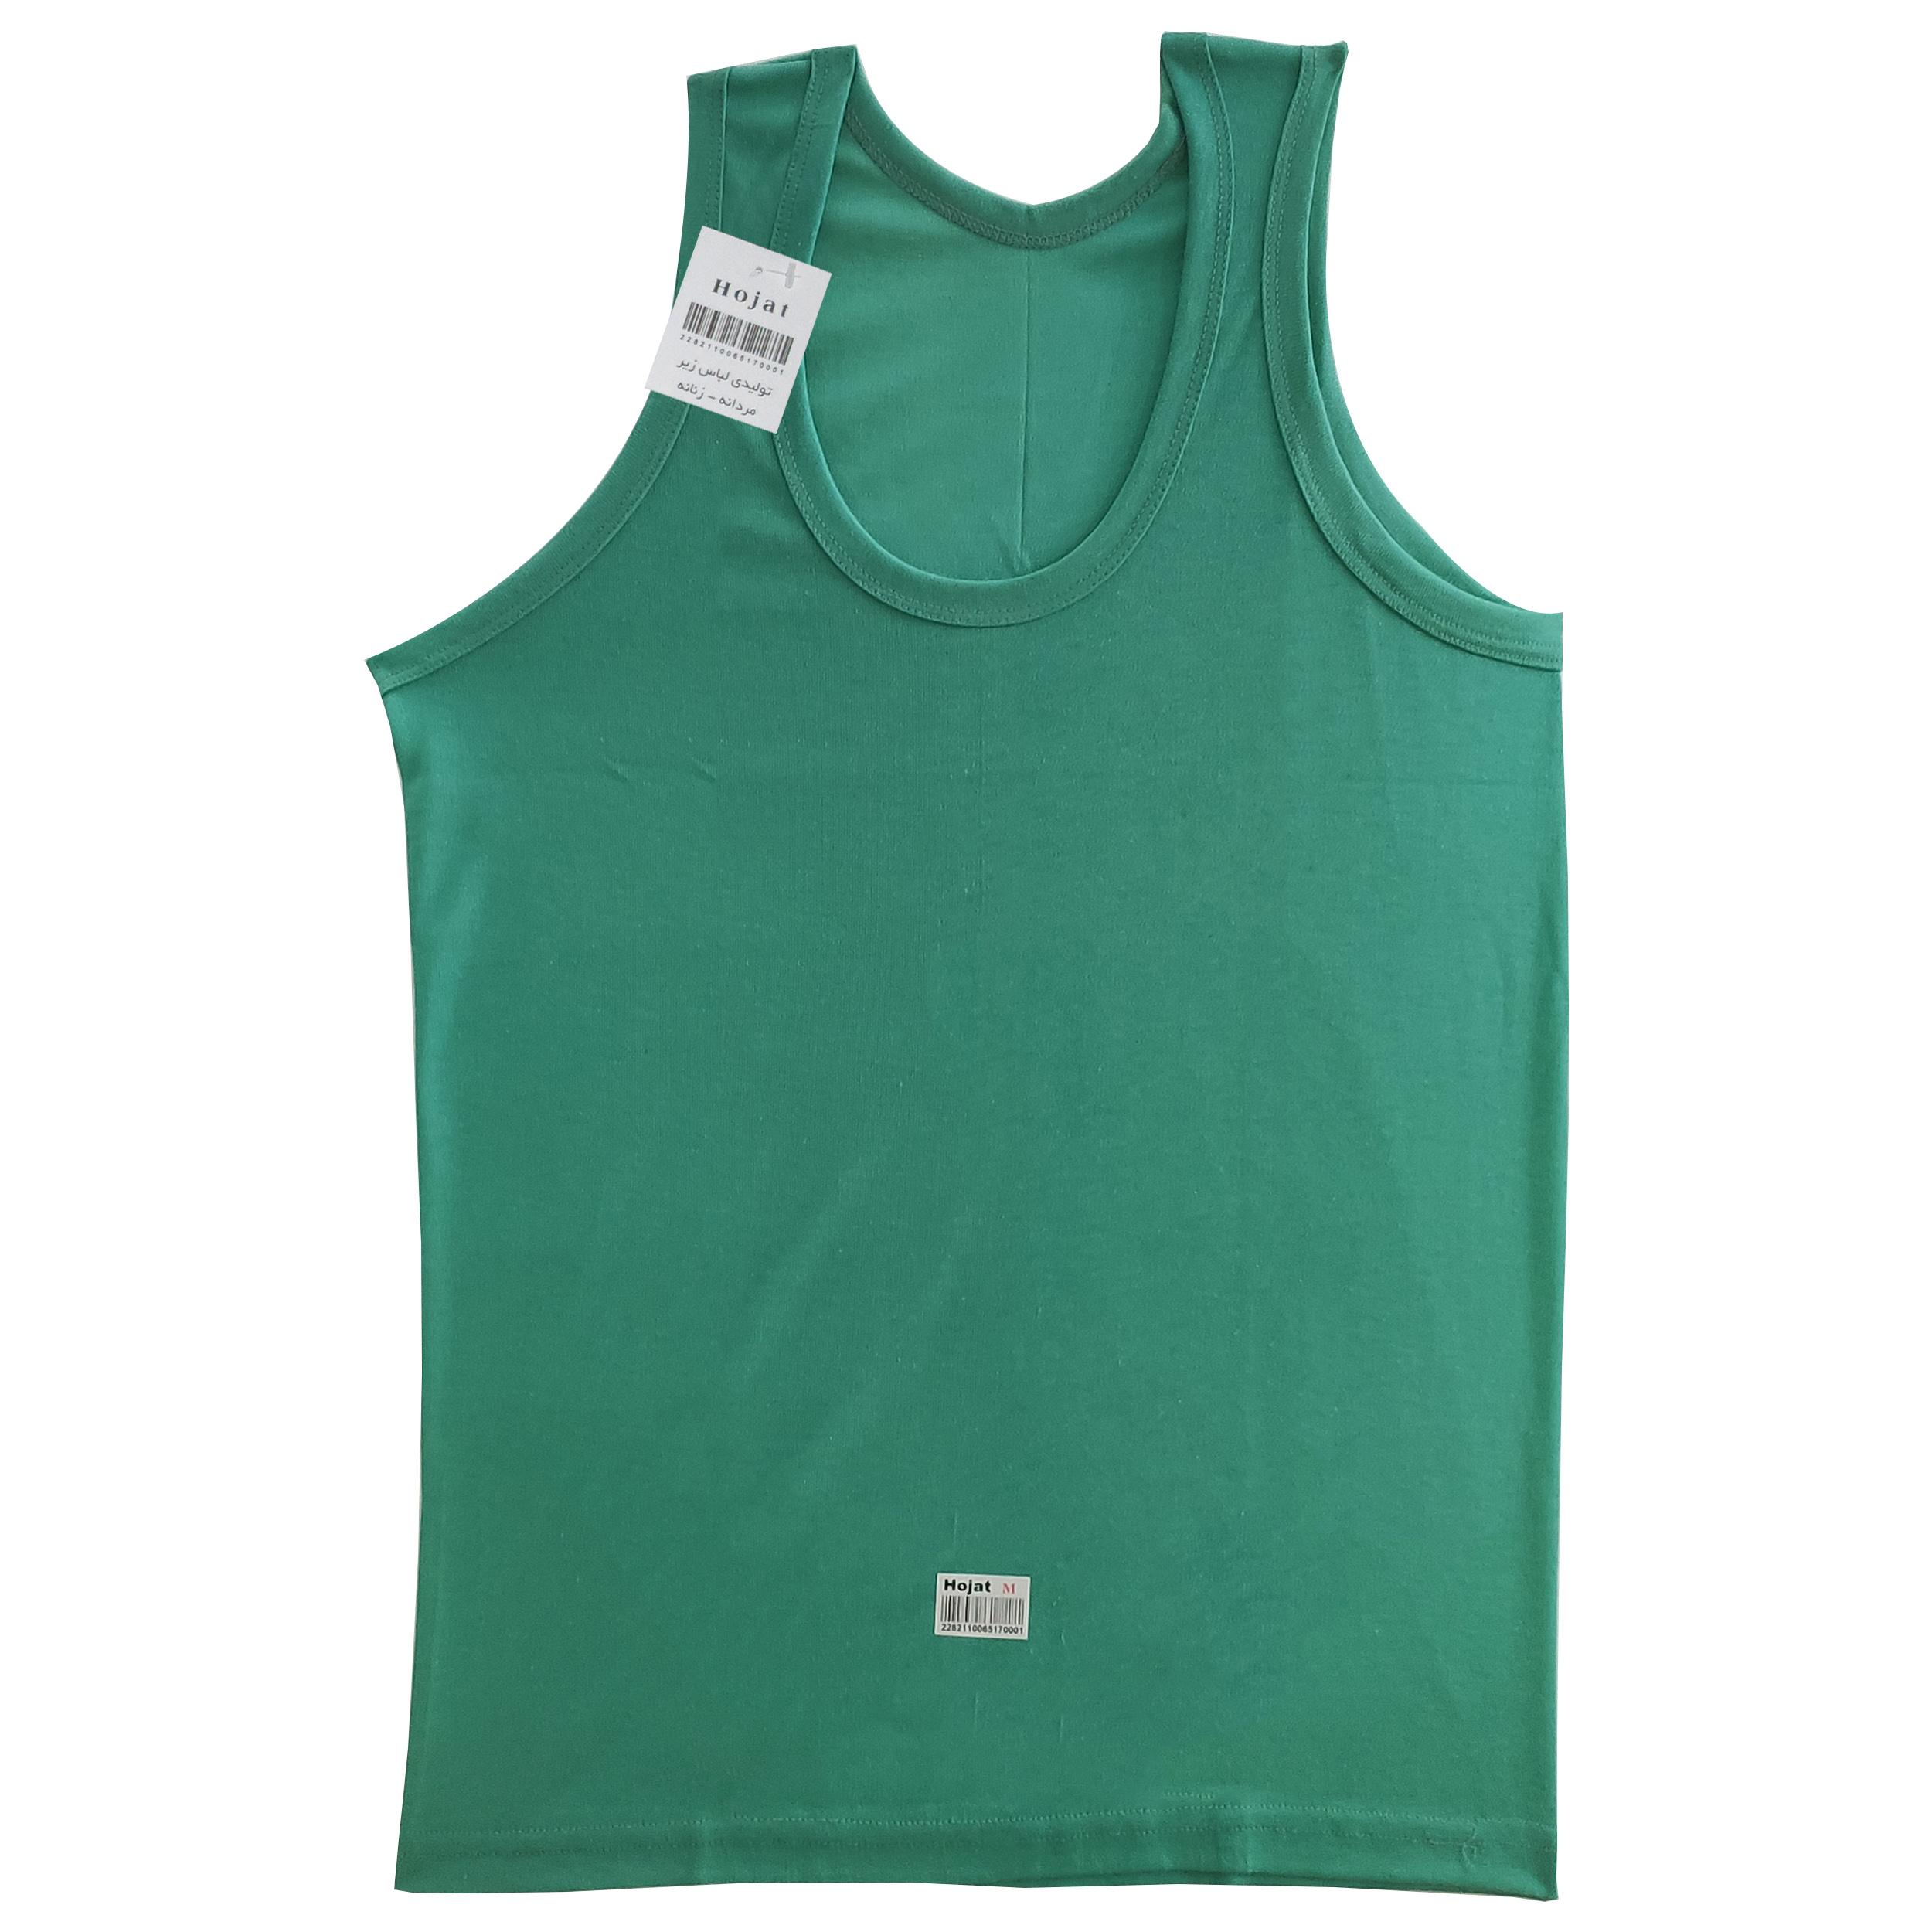 زیرپوش پسرانه حجت مدل REK کد 30587 رنگ سبز روشن